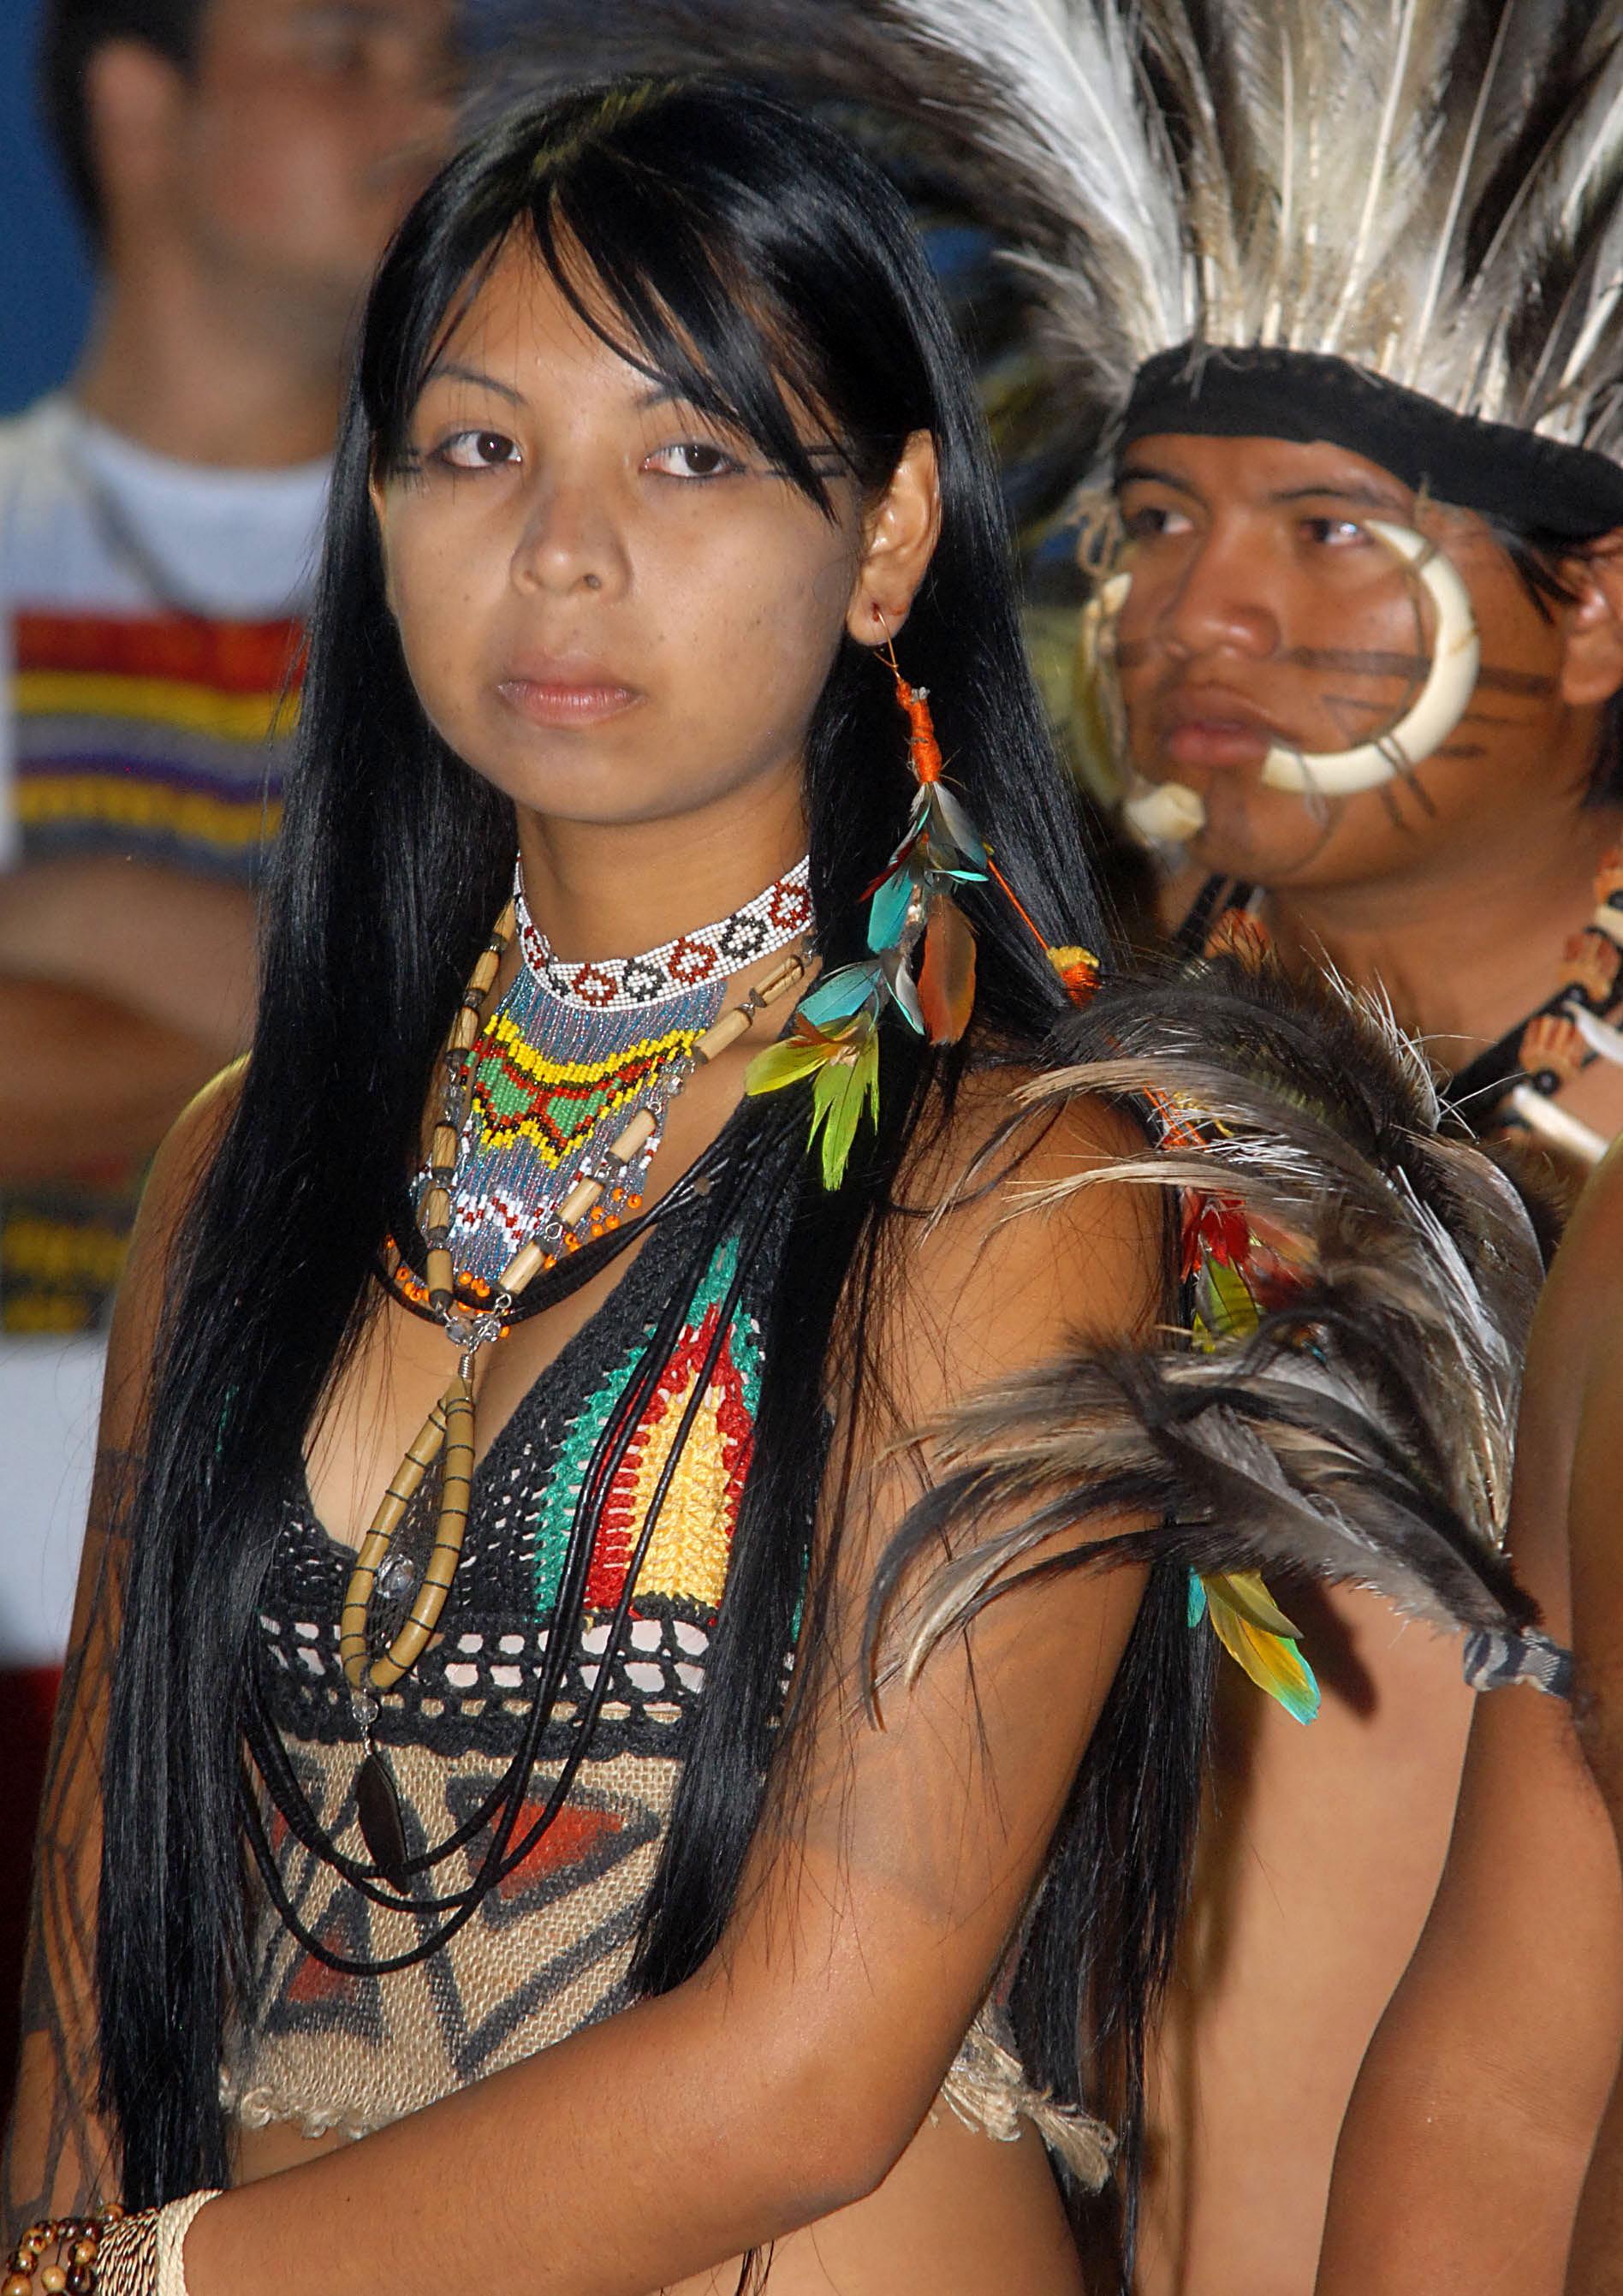 https://upload.wikimedia.org/wikipedia/commons/c/c6/%C3%8Dndia_da_etnia_Terena.jpg